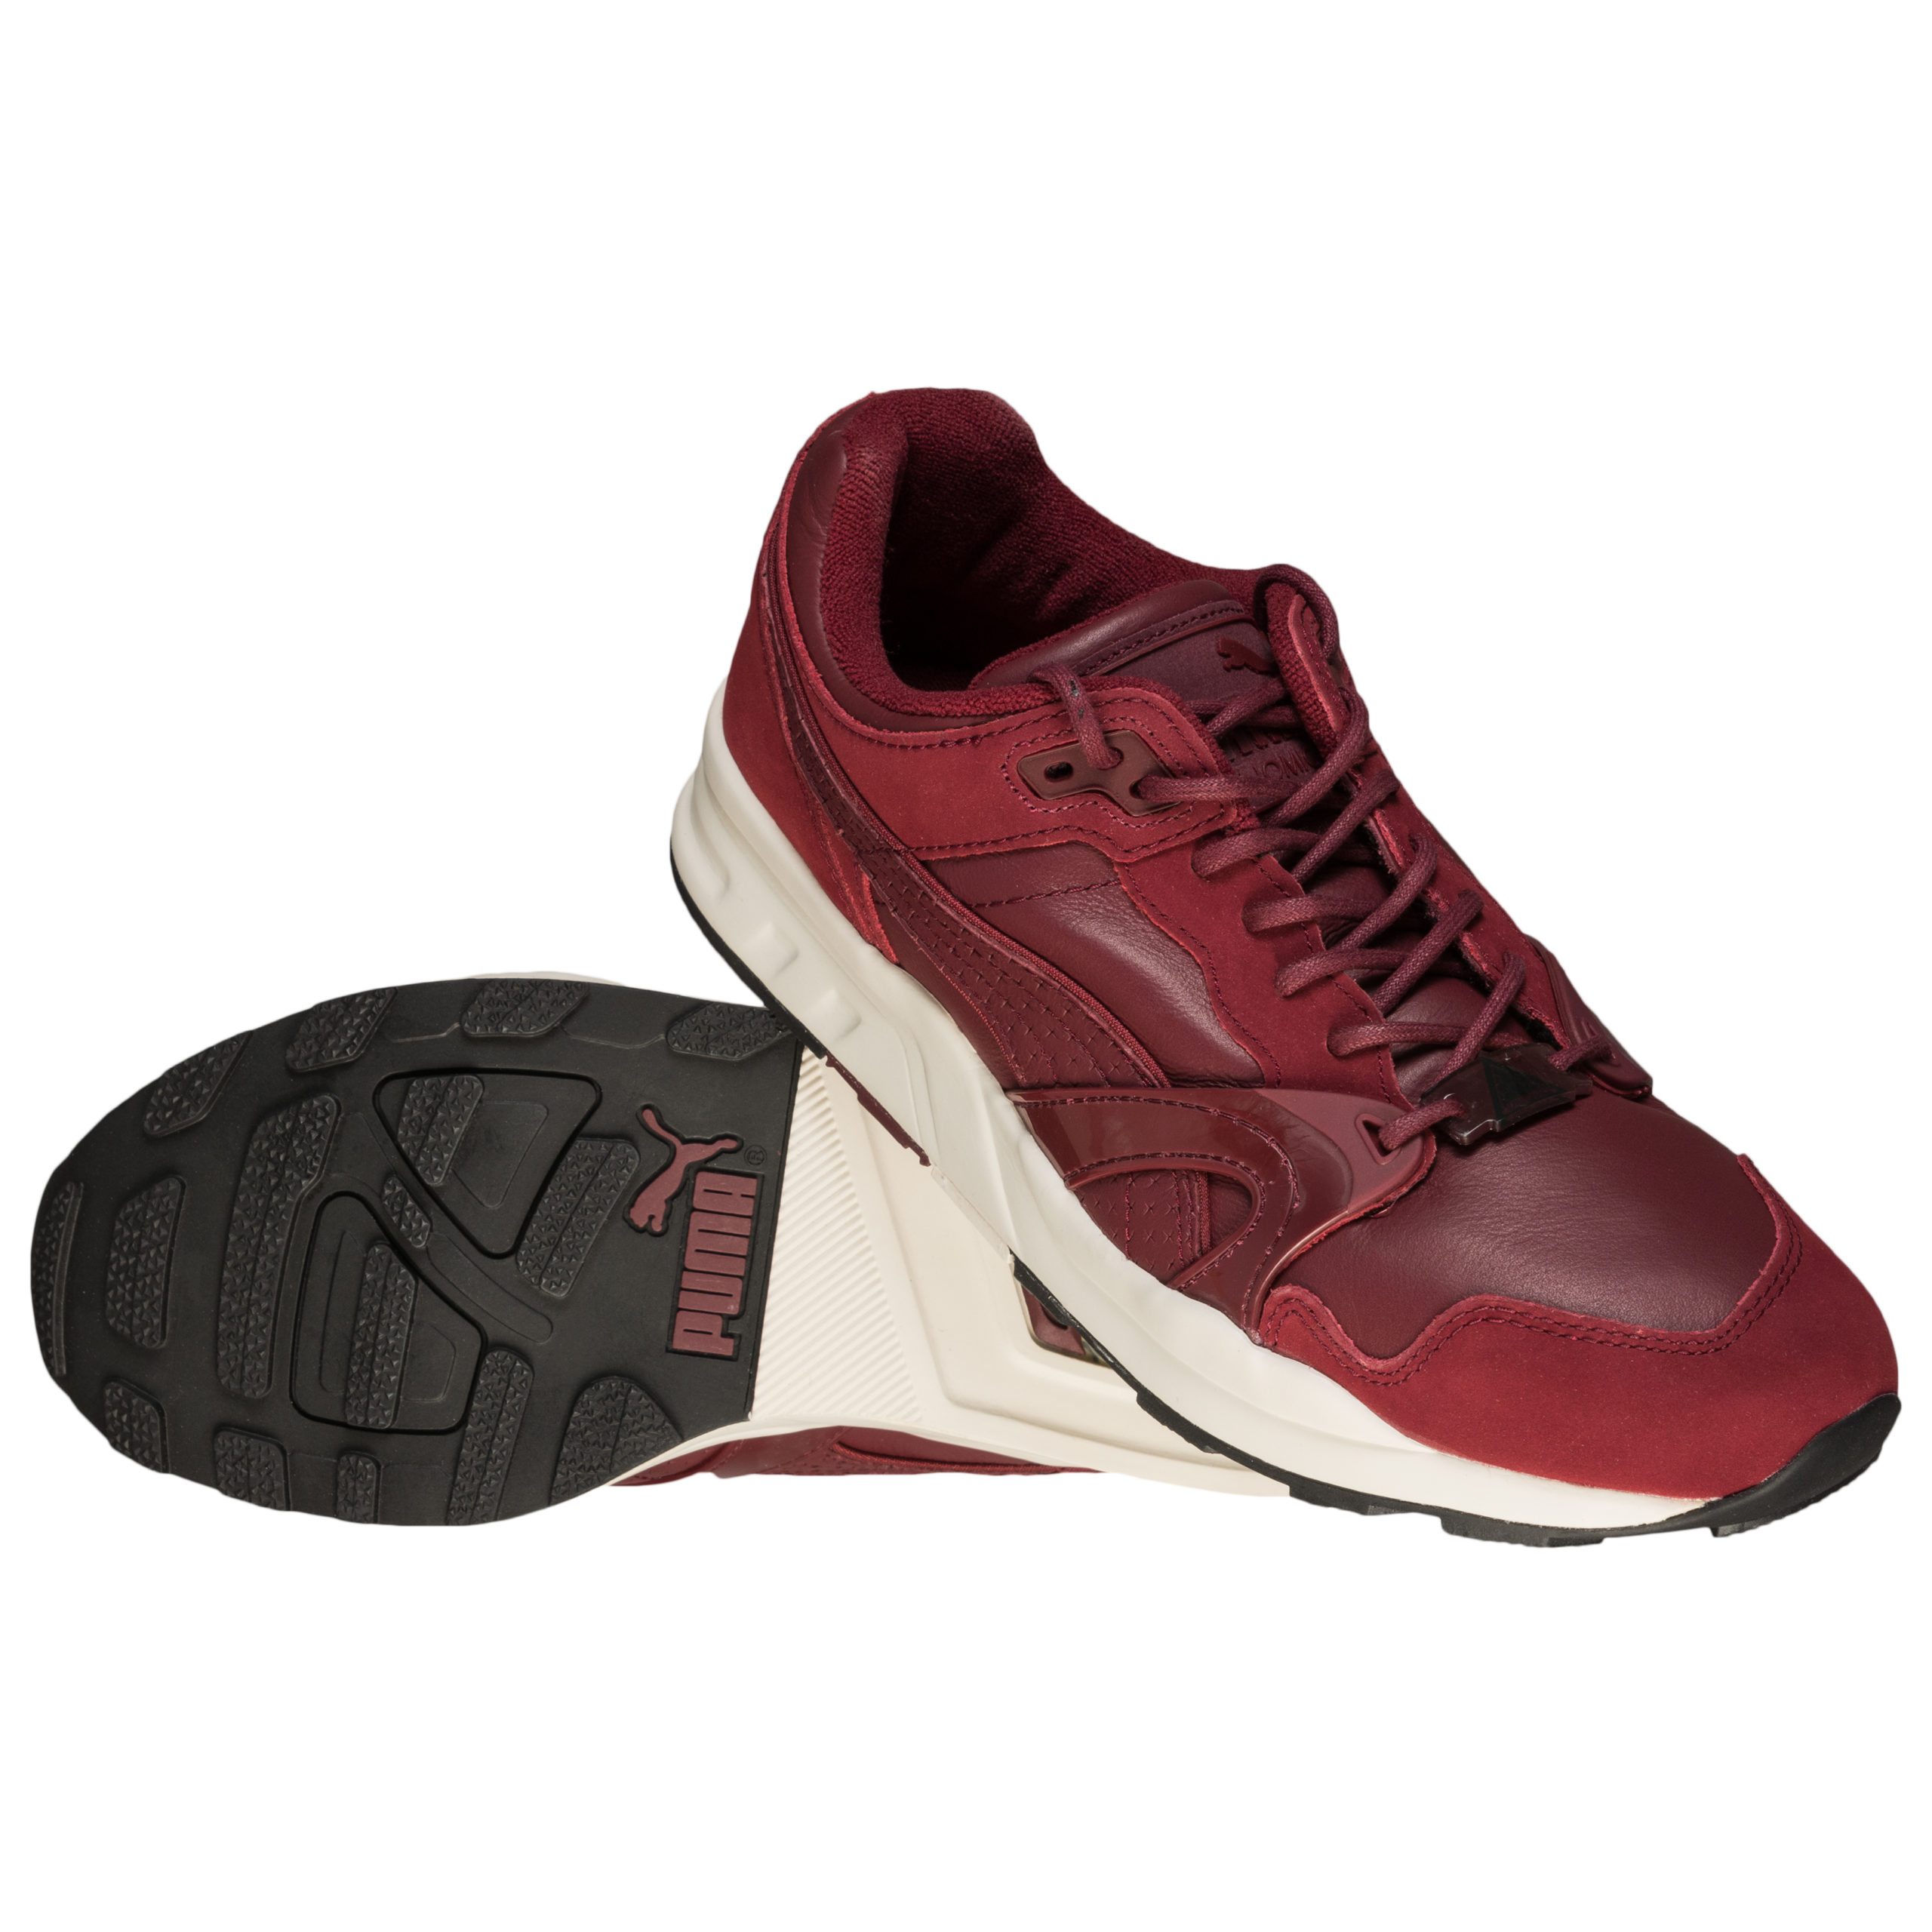 SportSpar PUMA Trinomic XT1 City Series Sneaker 359234-04